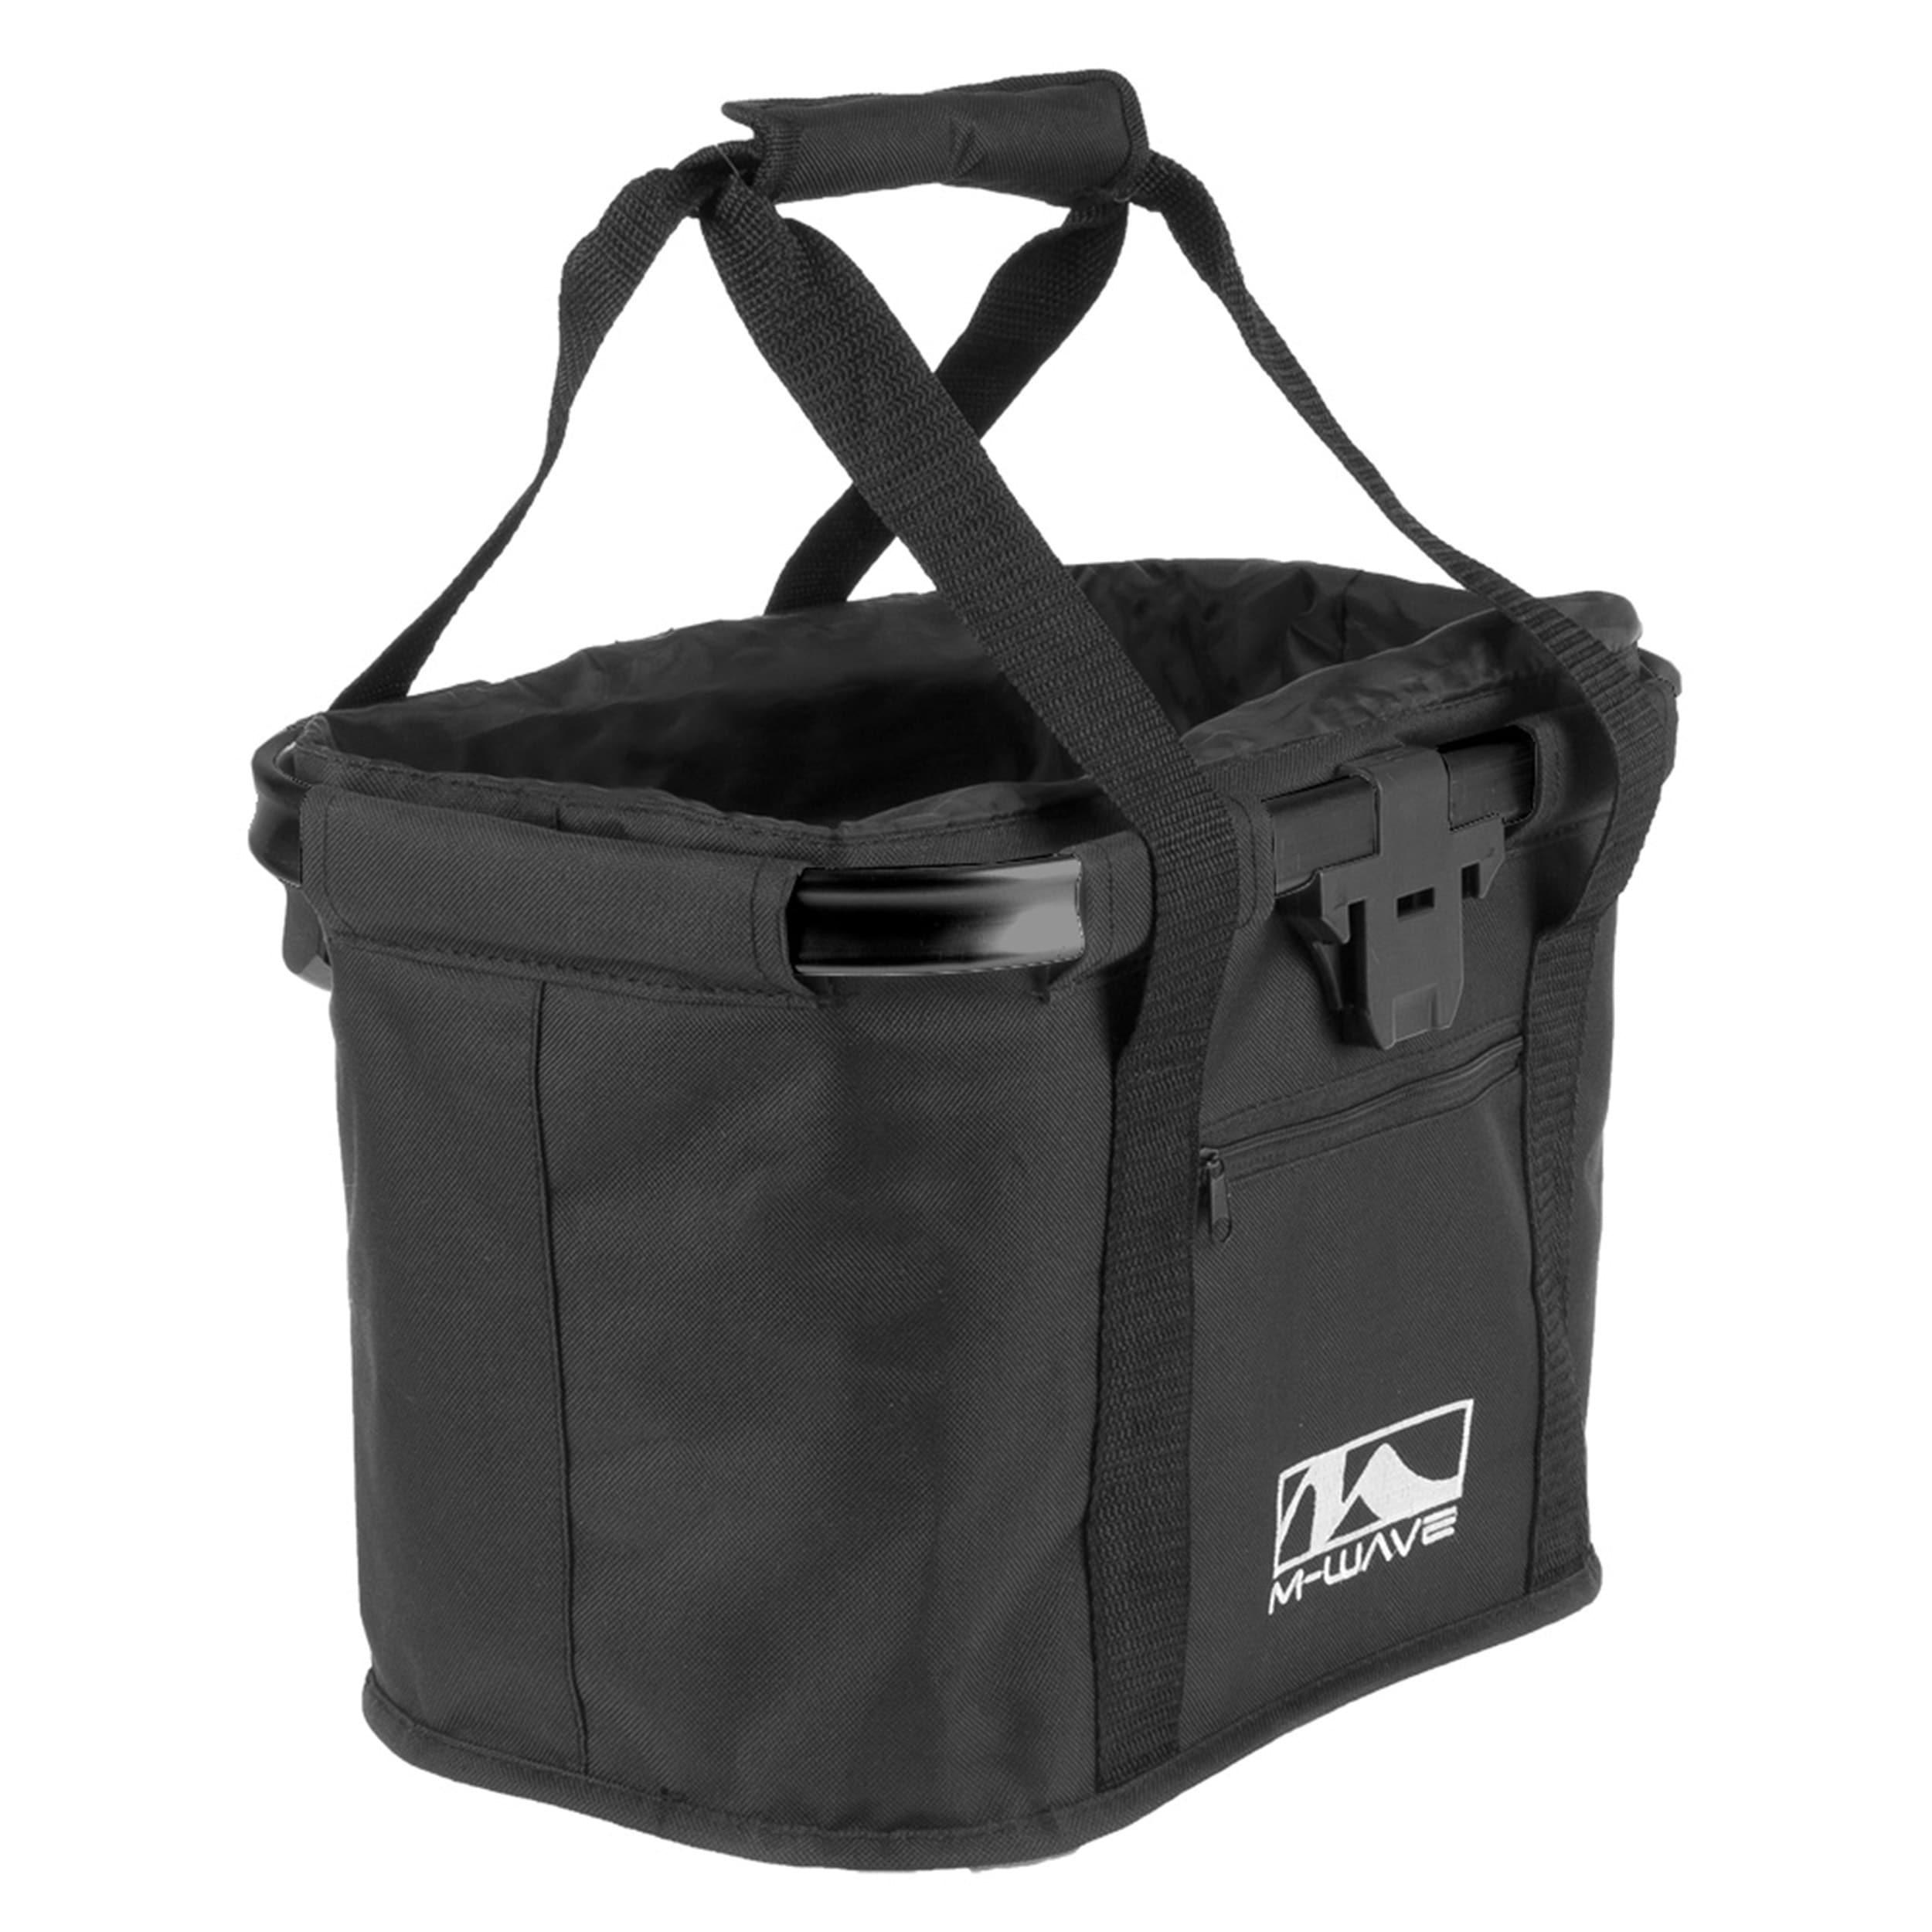 M-Wave Utrecht Black Folding Handlebar Bag (Black)